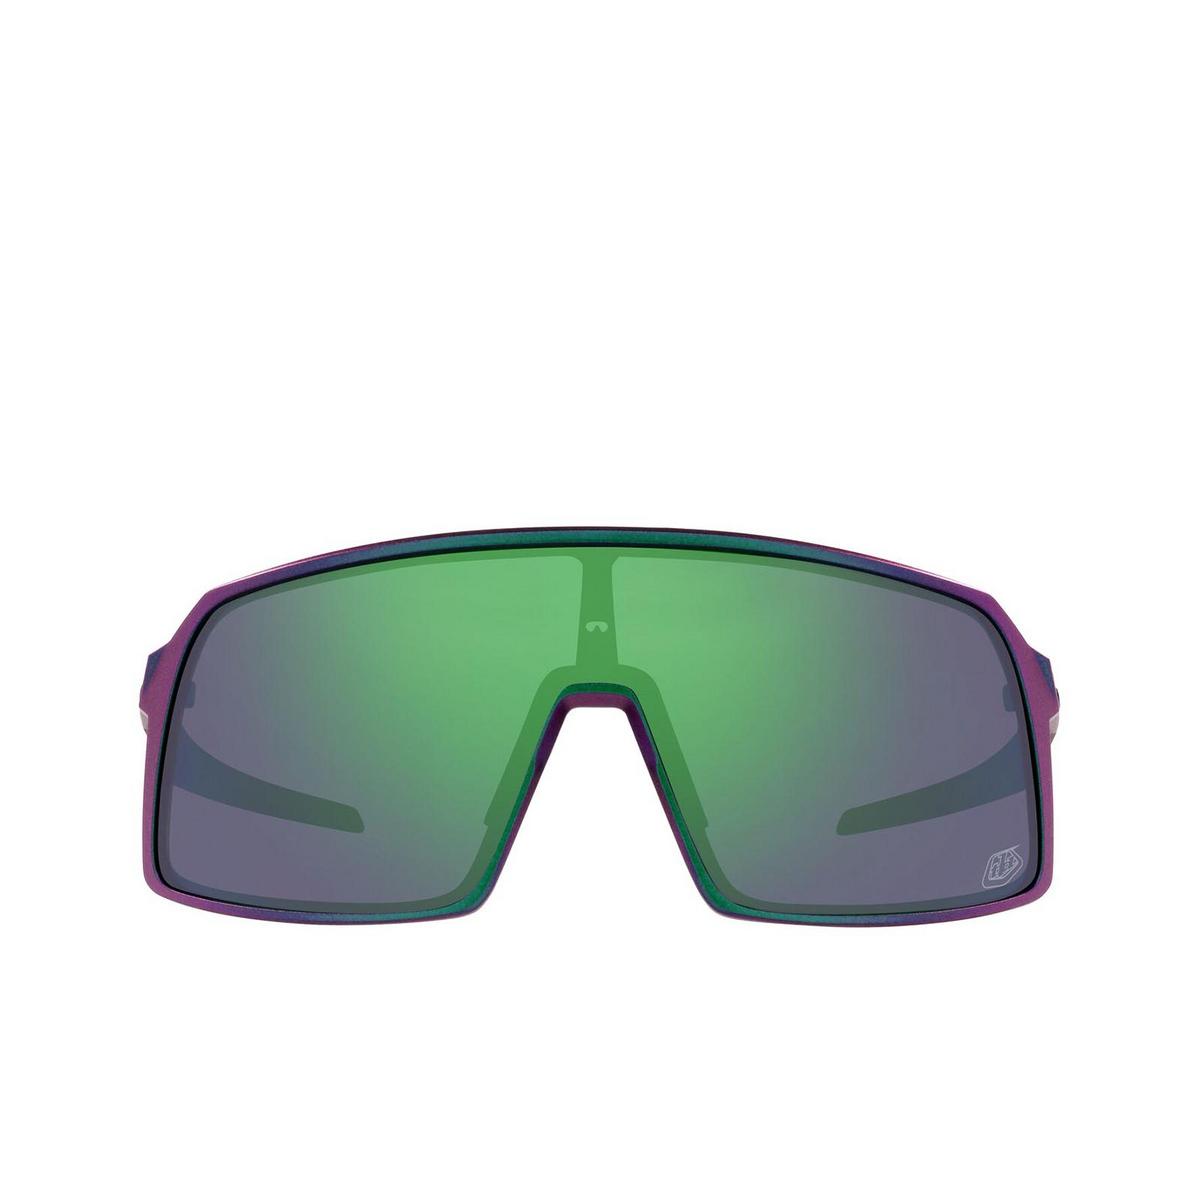 Oakley® Rectangle Sunglasses: Sutro OO9406 color Tld Matte Purple Green Shift 940647 - front view.